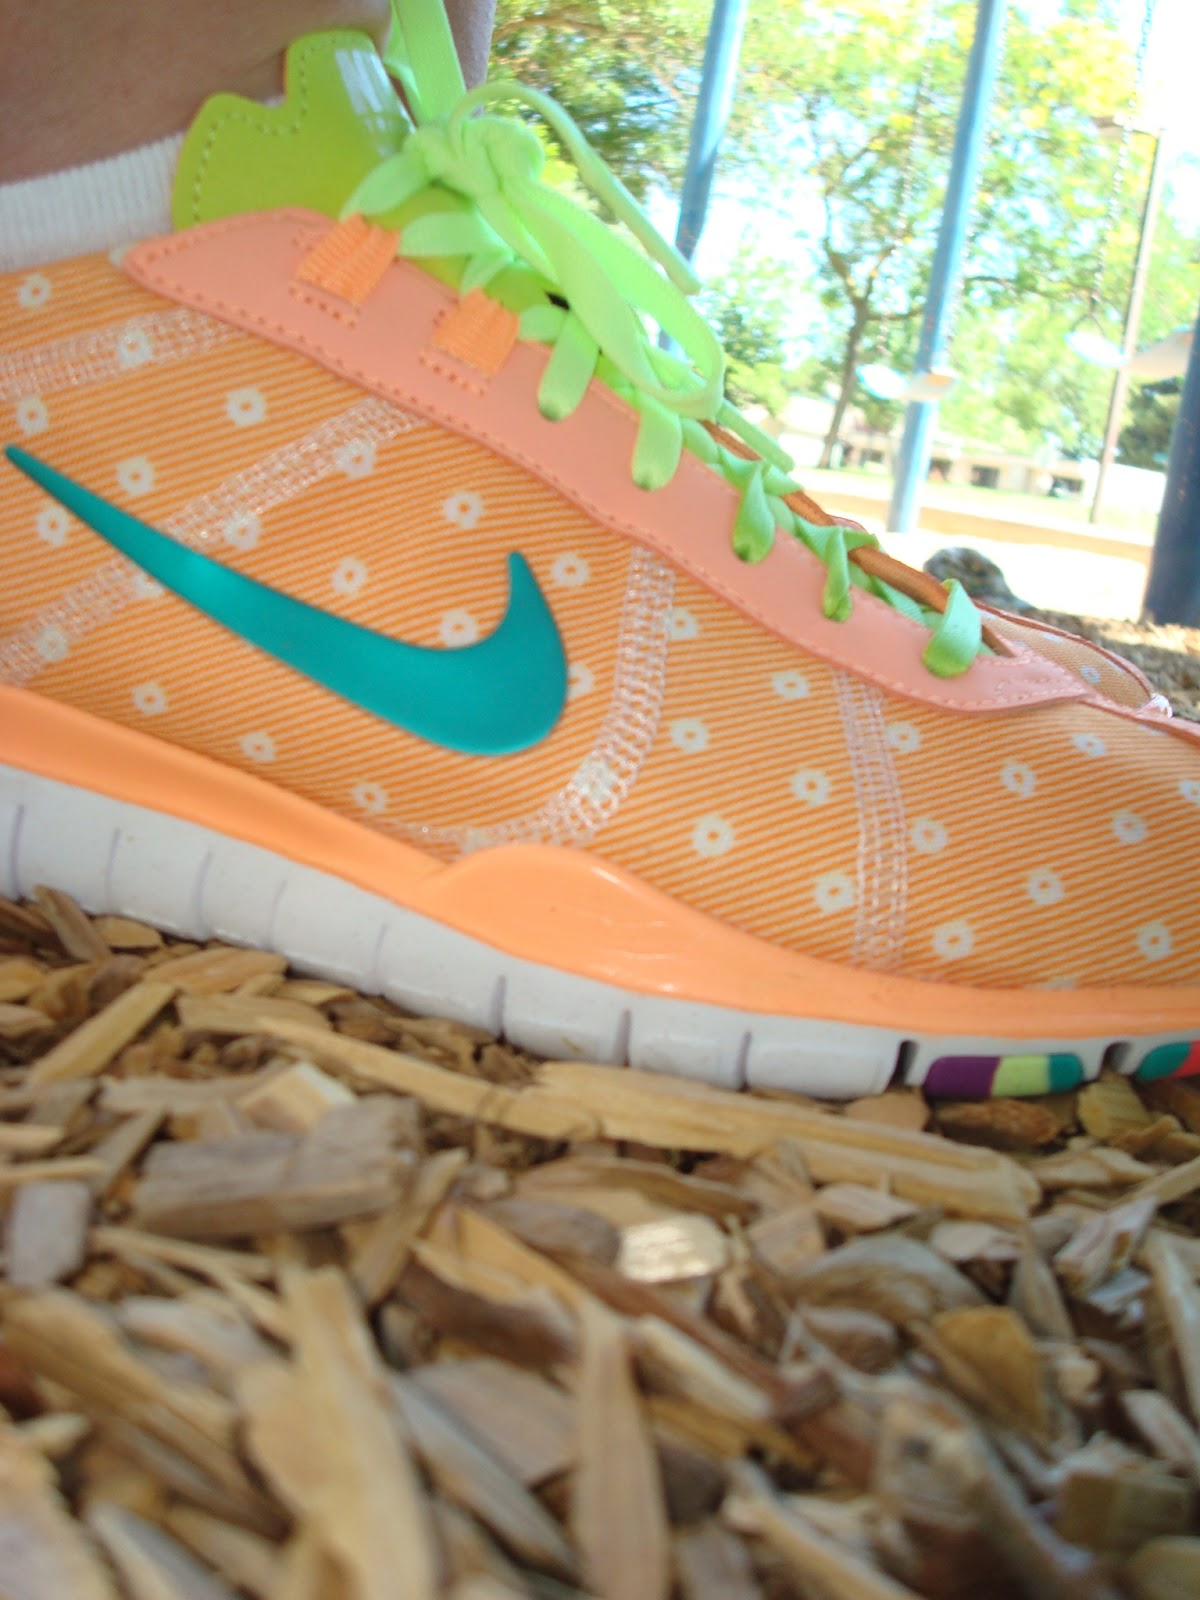 http://1.bp.blogspot.com/-N9OlP3U7C0Y/T-t8dYHxeAI/AAAAAAAAB6Q/dujhEj2LY68/s1600/NikeShoes2.jpg